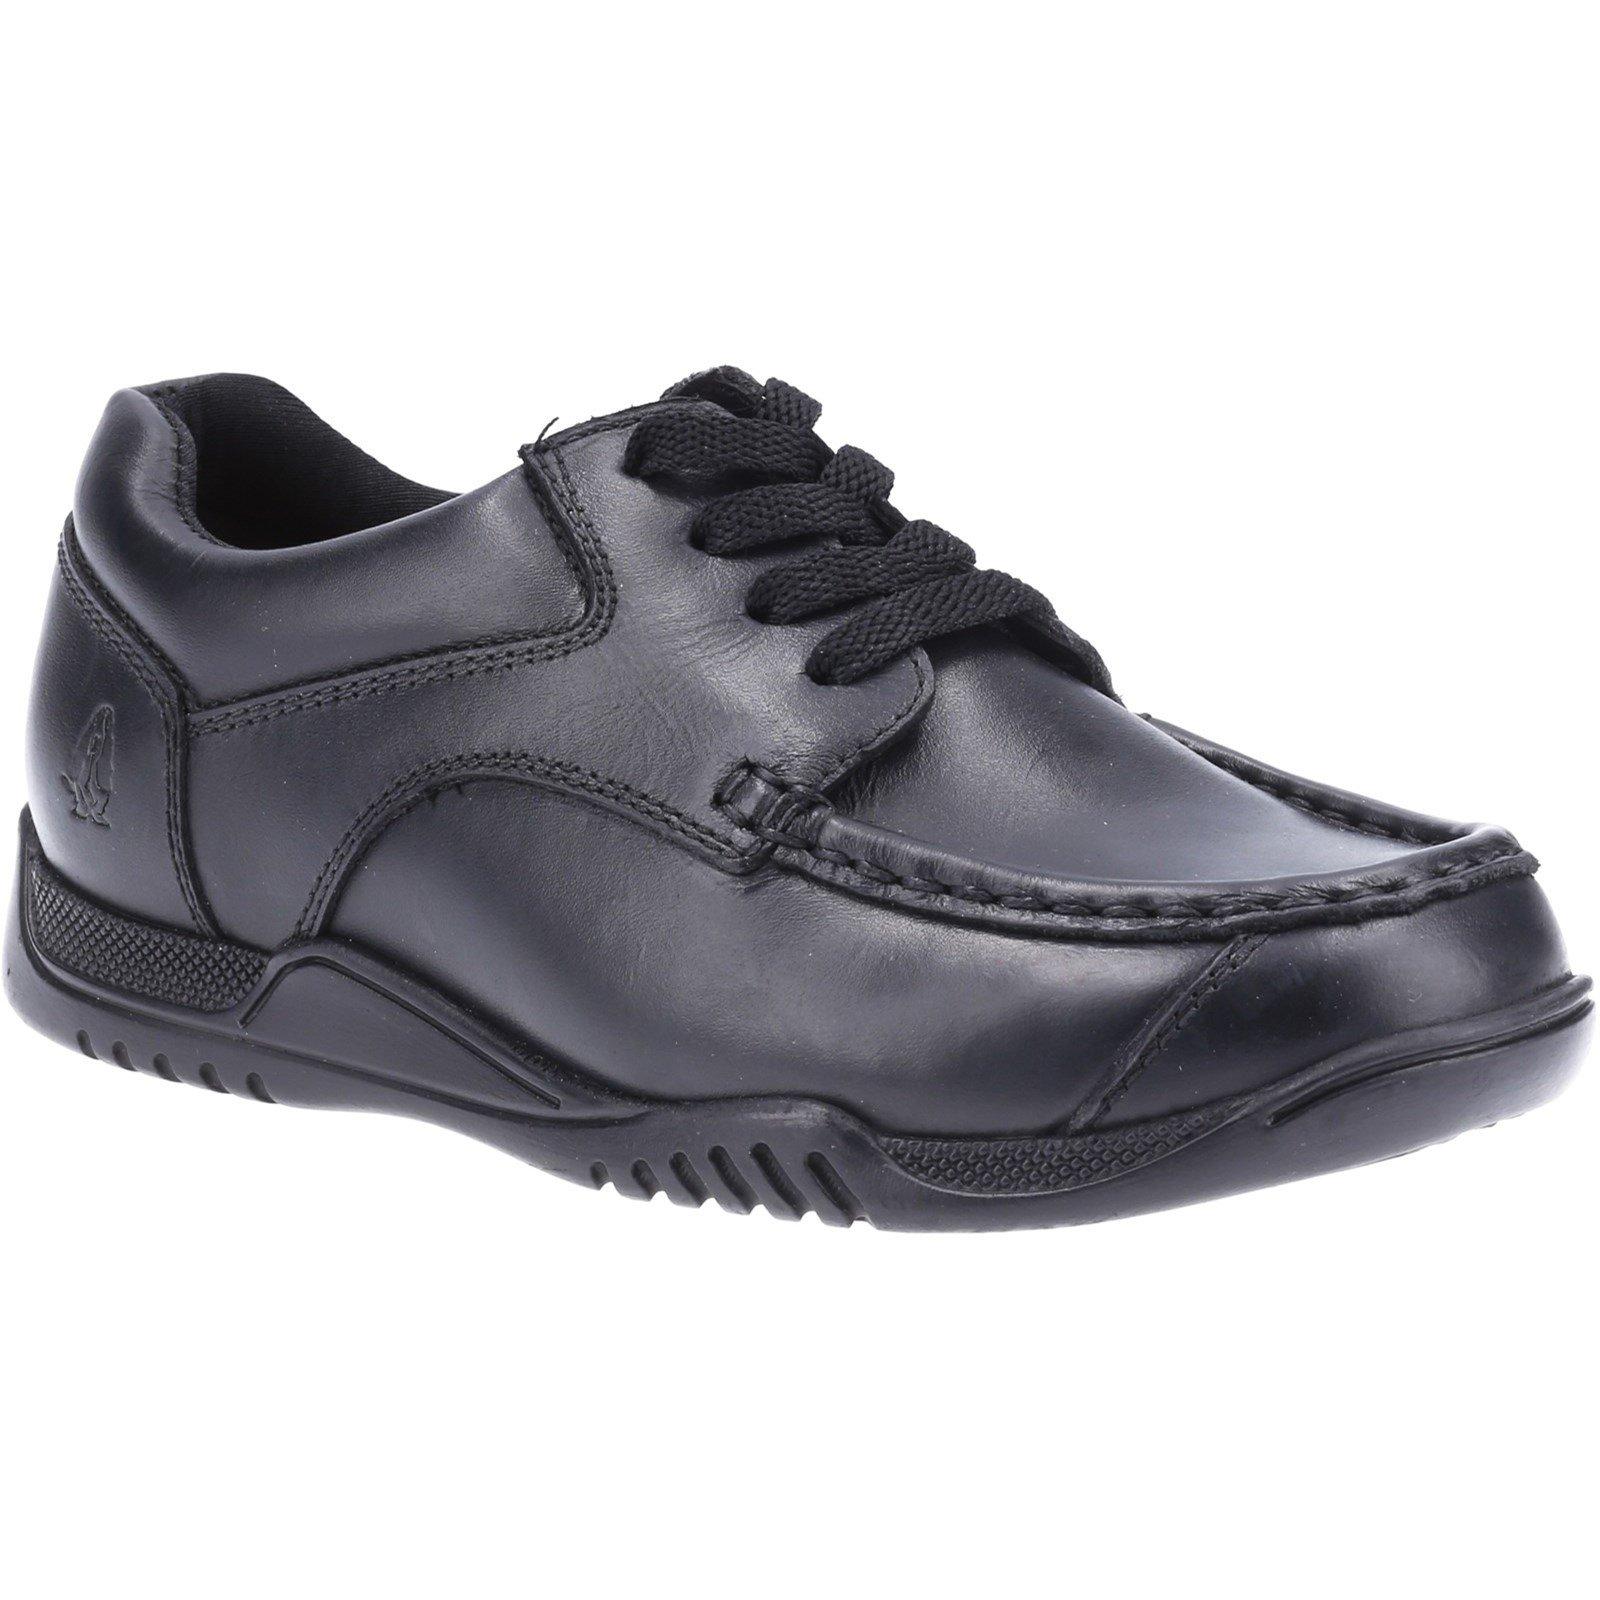 Hush Puppies Kid's Hudson Senior School Shoe Black 32583 - Black 5